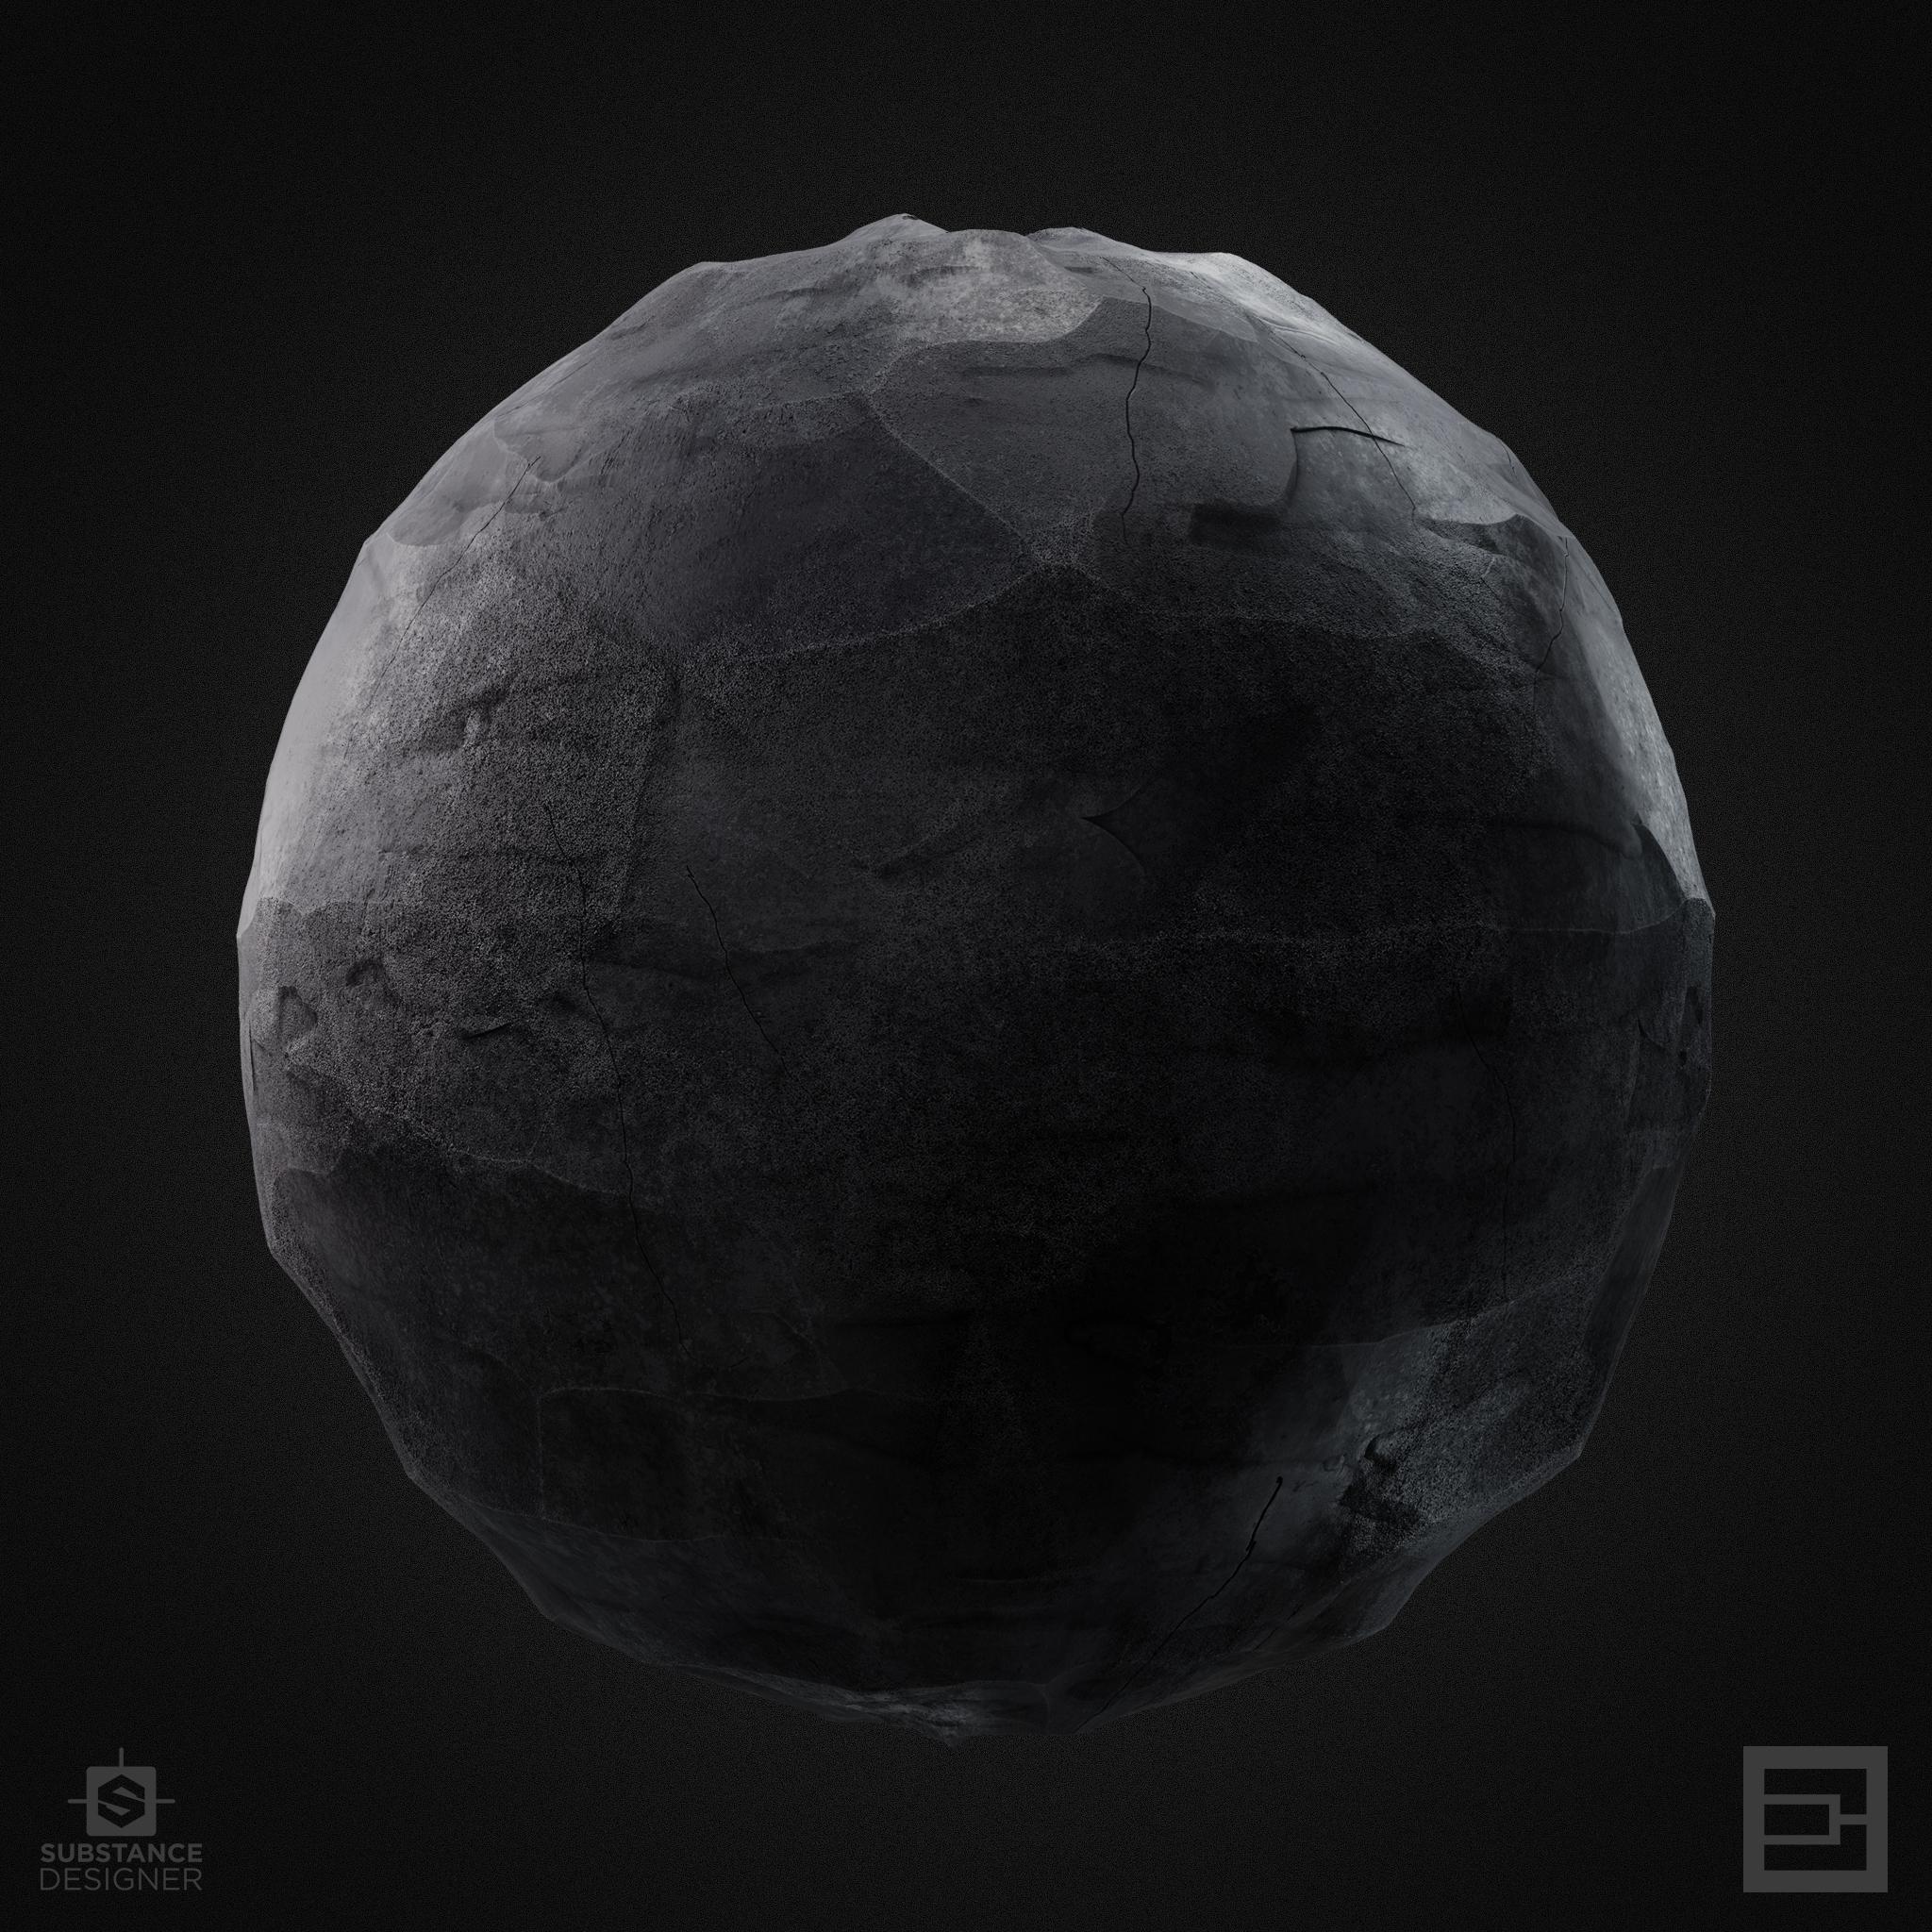 RockGeneric_01_Sphere.jpg